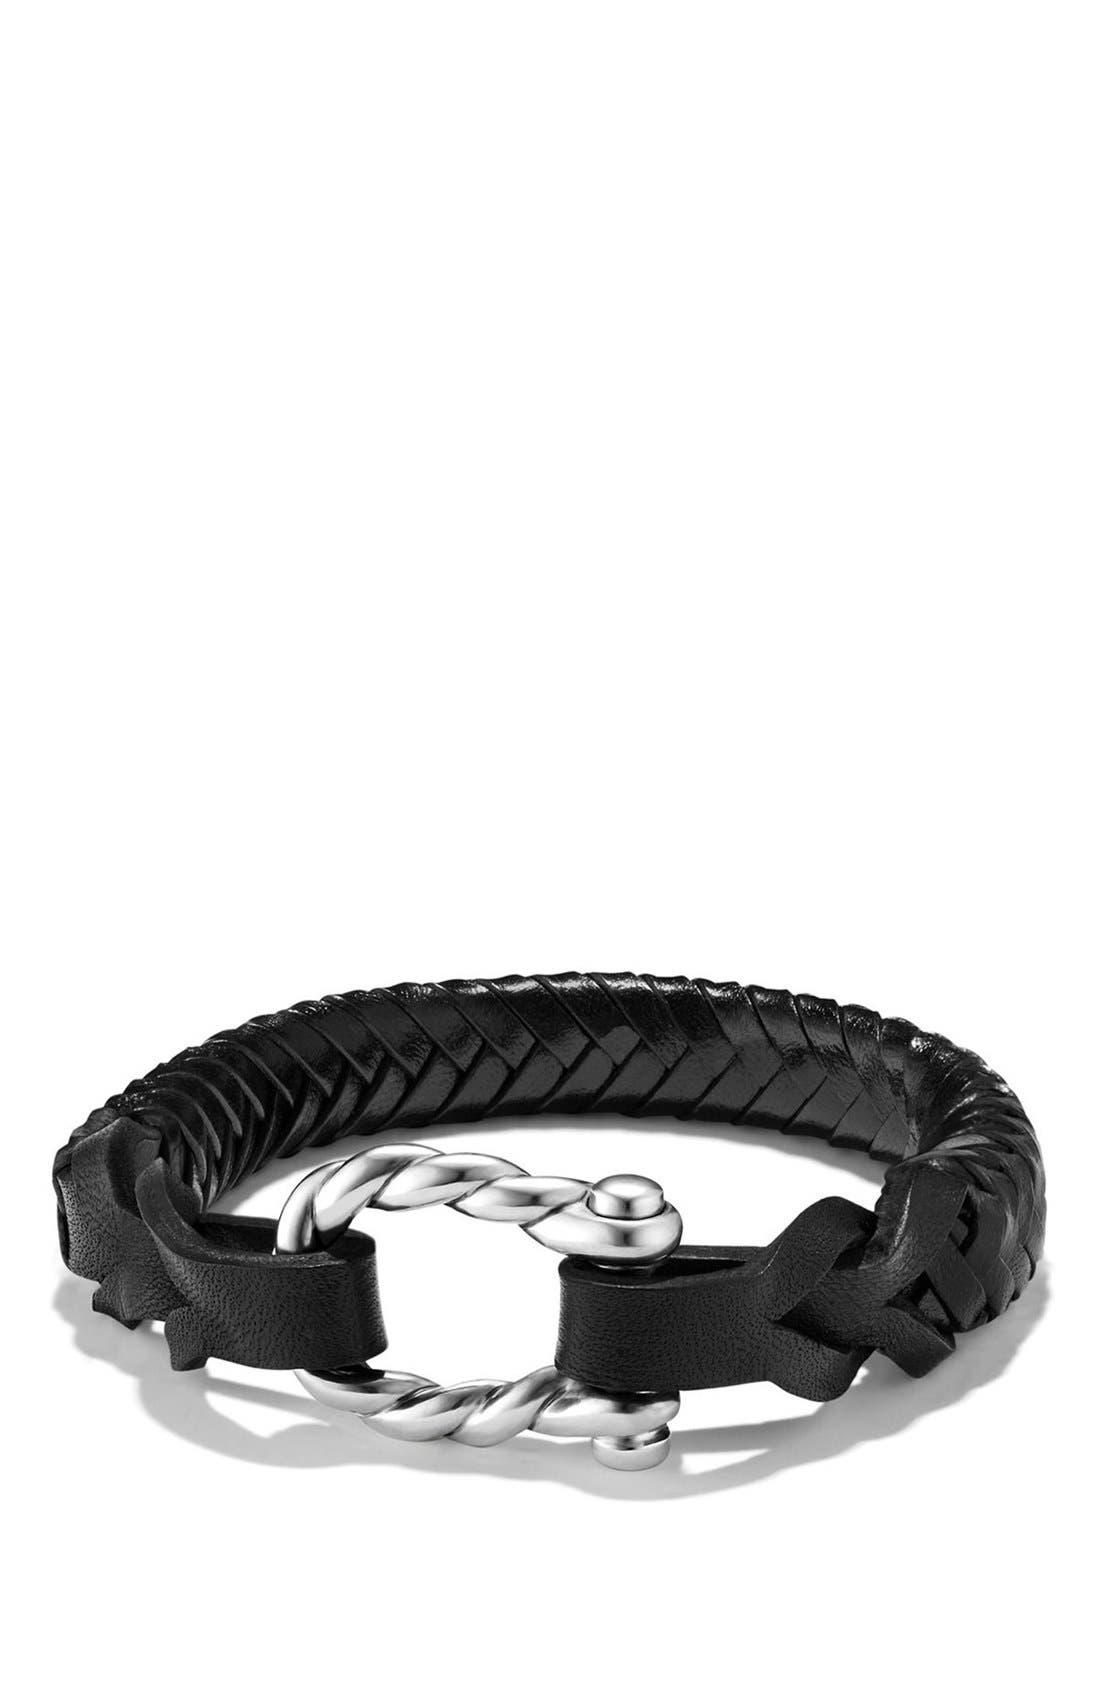 DAVID YURMAN Maritime Leather Woven Shackle Bracelet